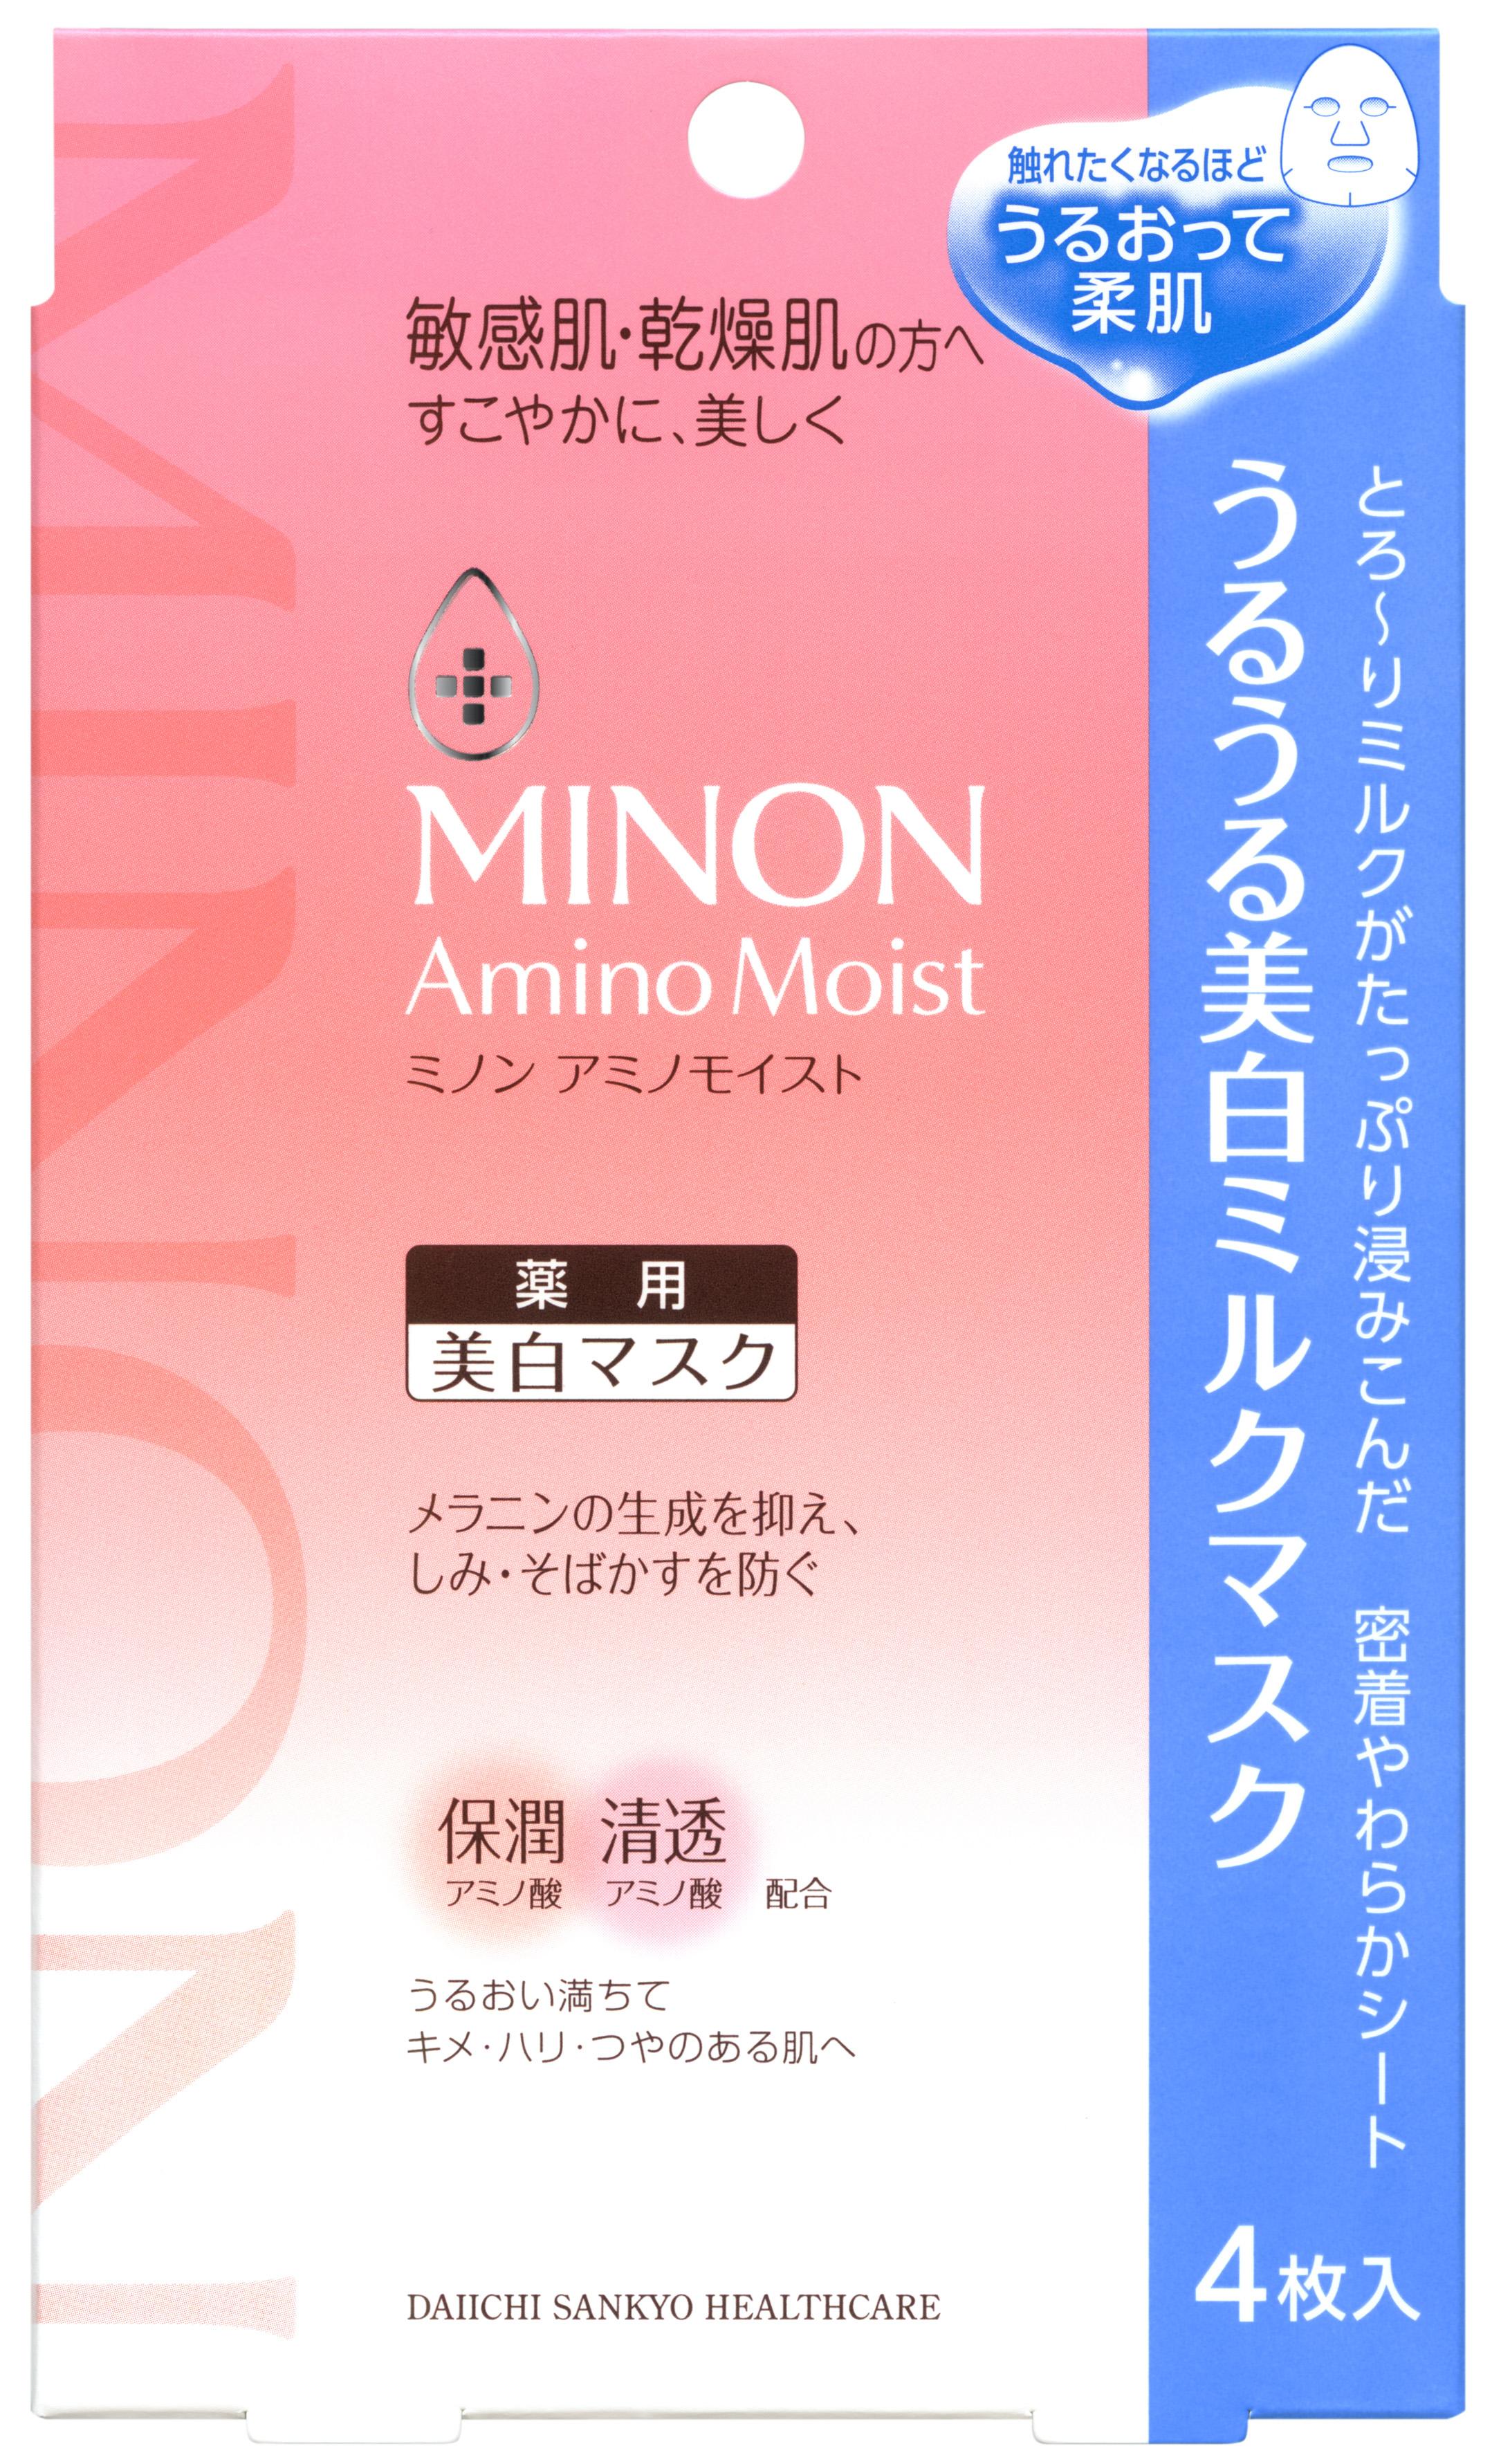 Minon Amino Moist Whitening Milk Mask Review